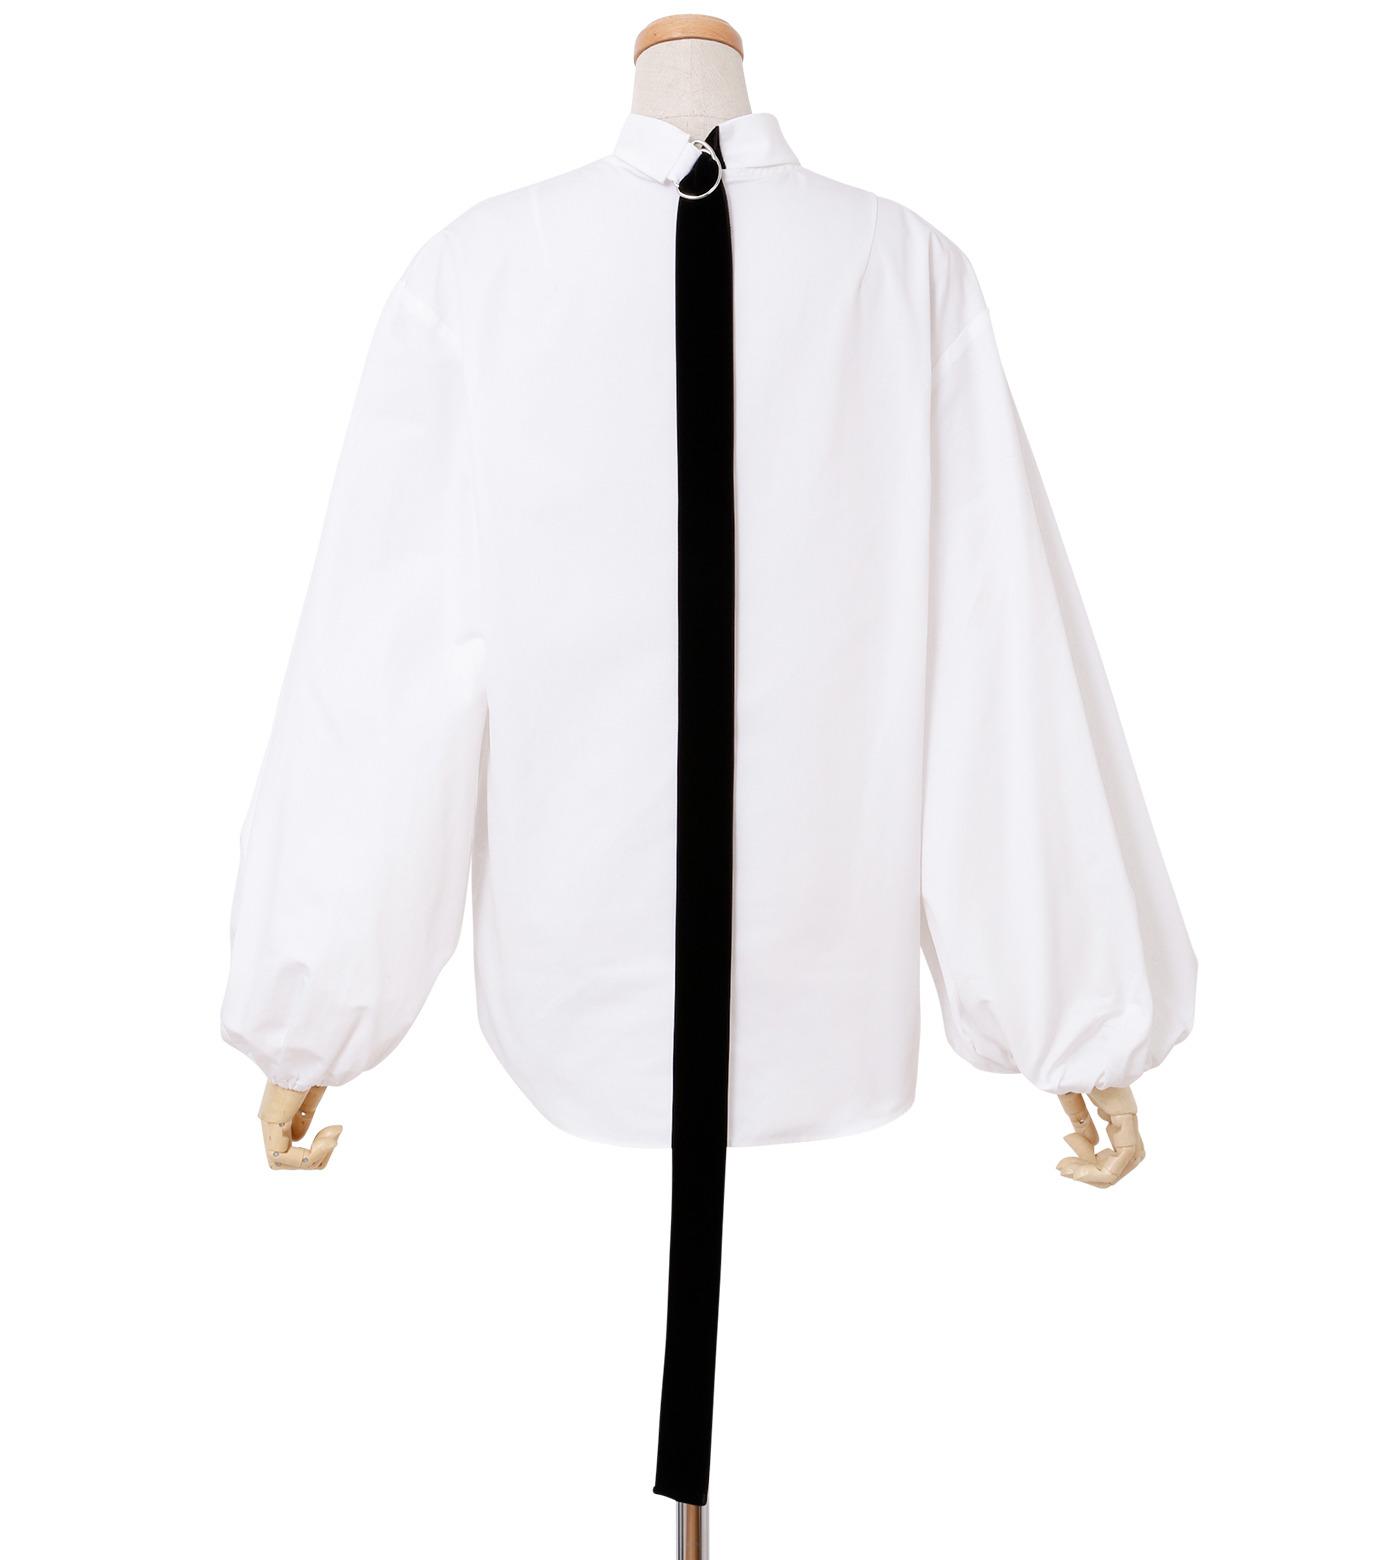 IRENE(アイレネ)のブァッファンスリーブトップス-WHITE(シャツ/shirt)-18A83004 拡大詳細画像3